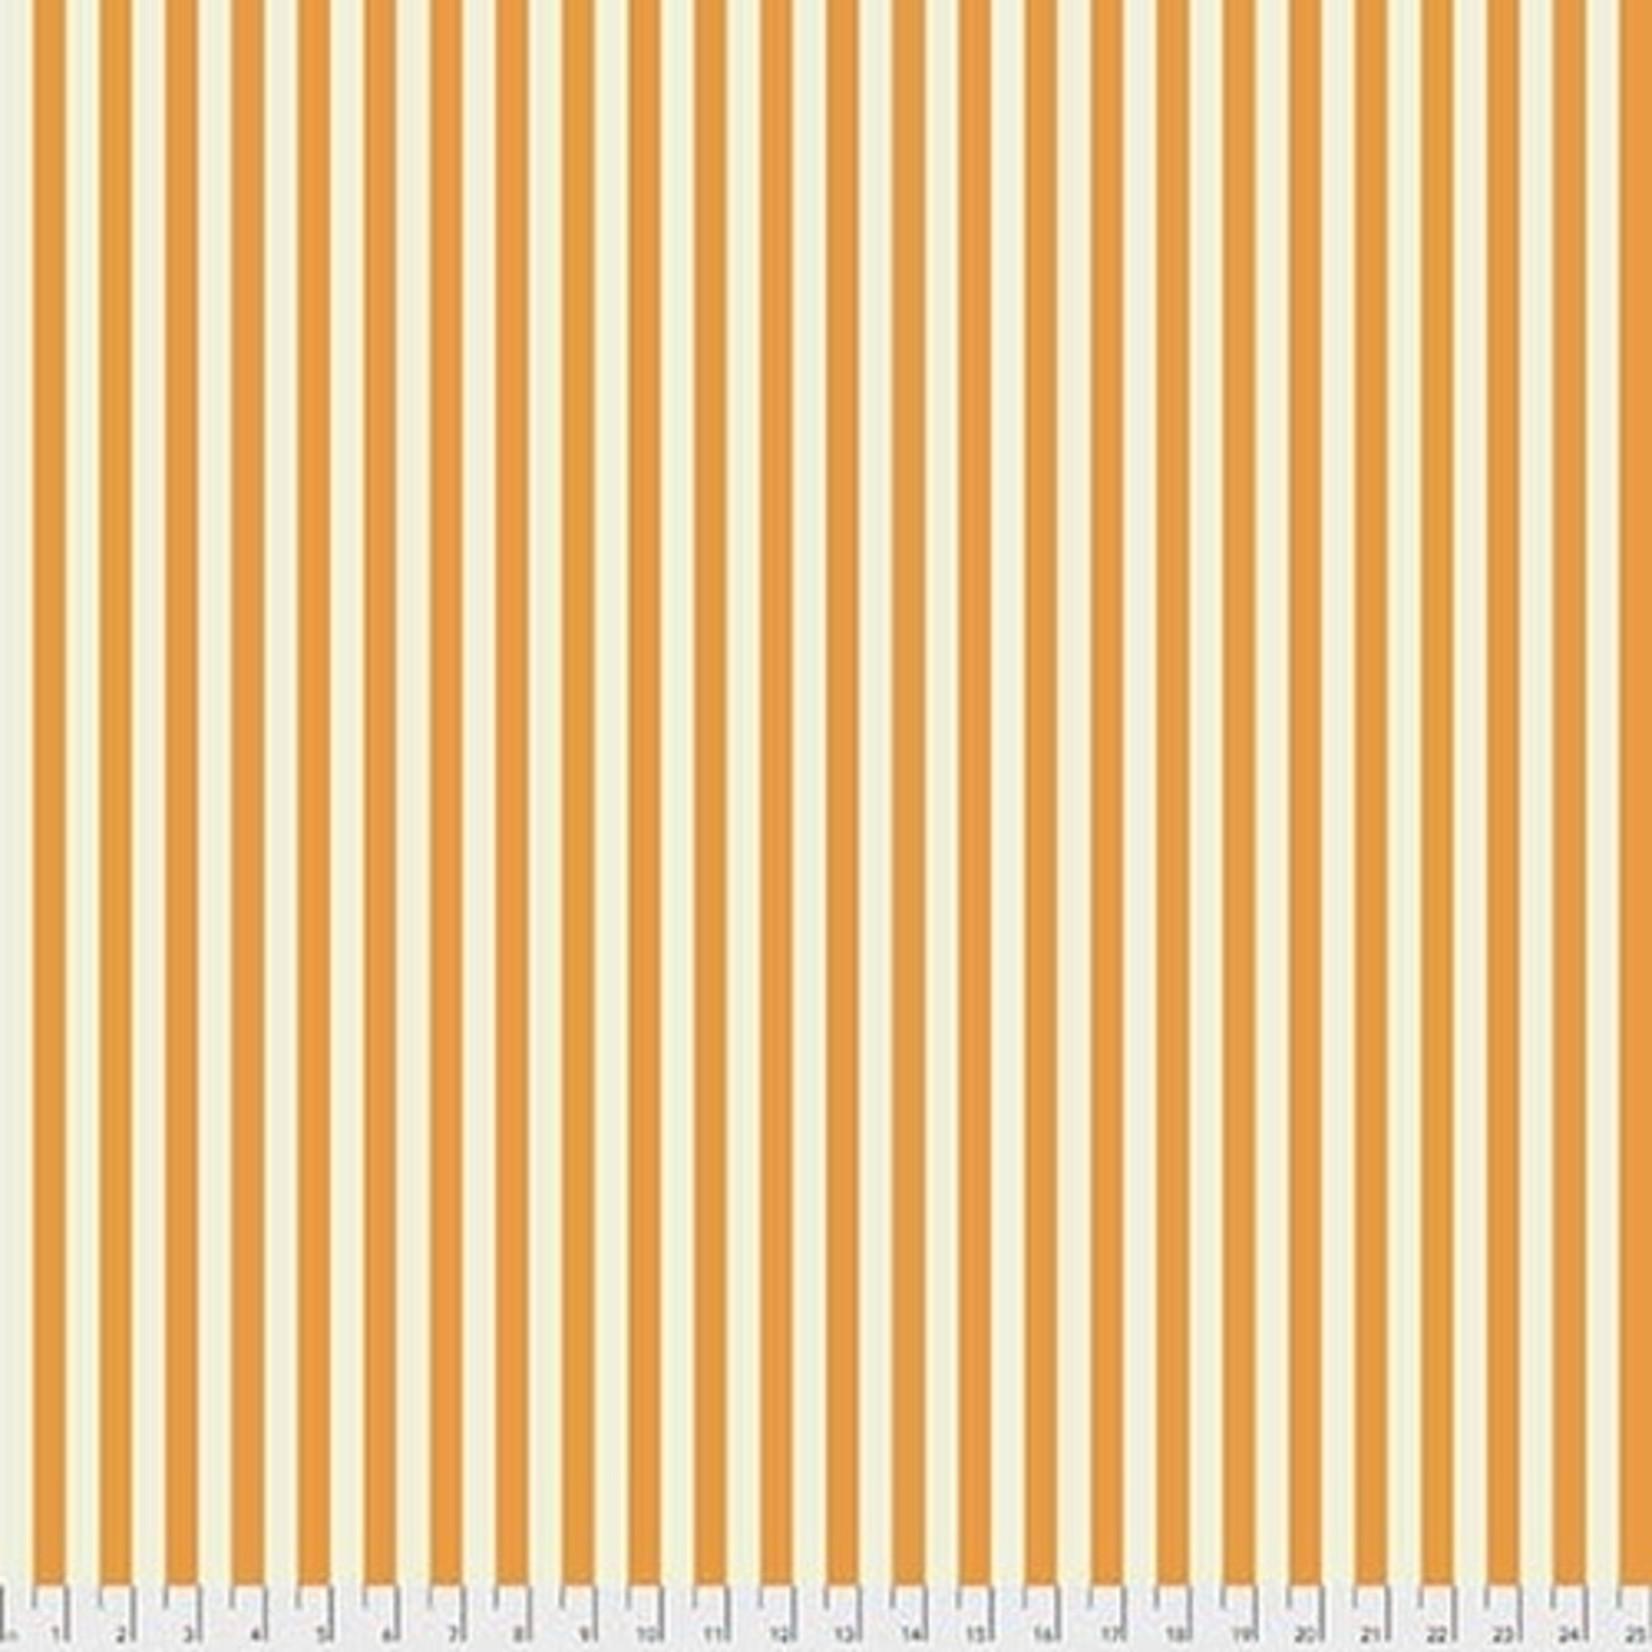 Tula Pink Tula Tent Stripe- Begonia 0.17 per cm or $17/m